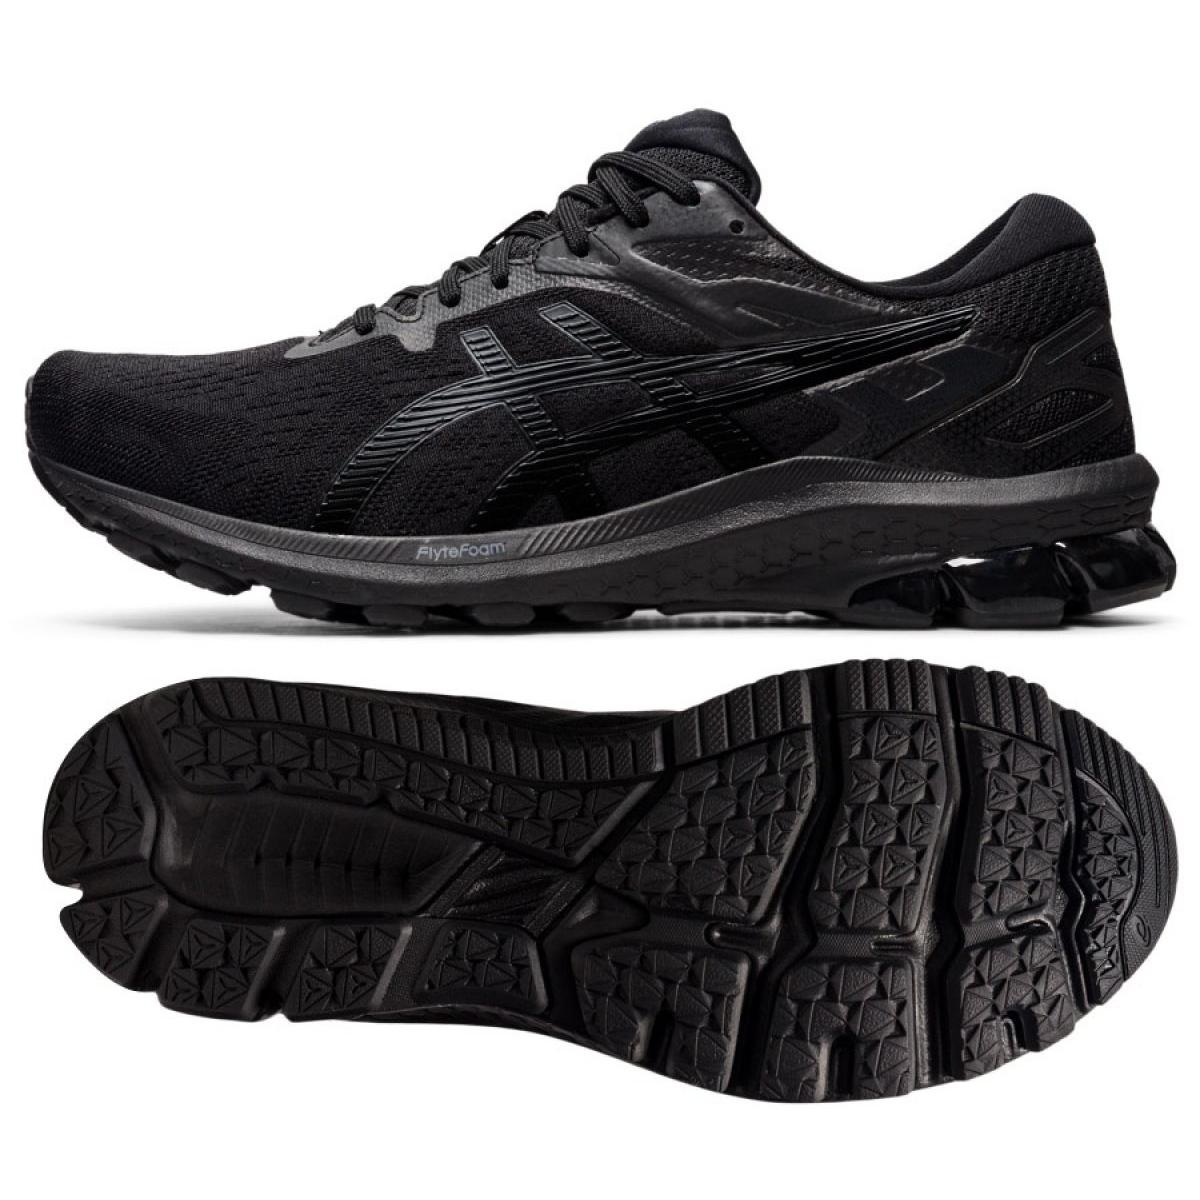 Asics GT-1000 10 M 1011B001-006 black - KeeShoes